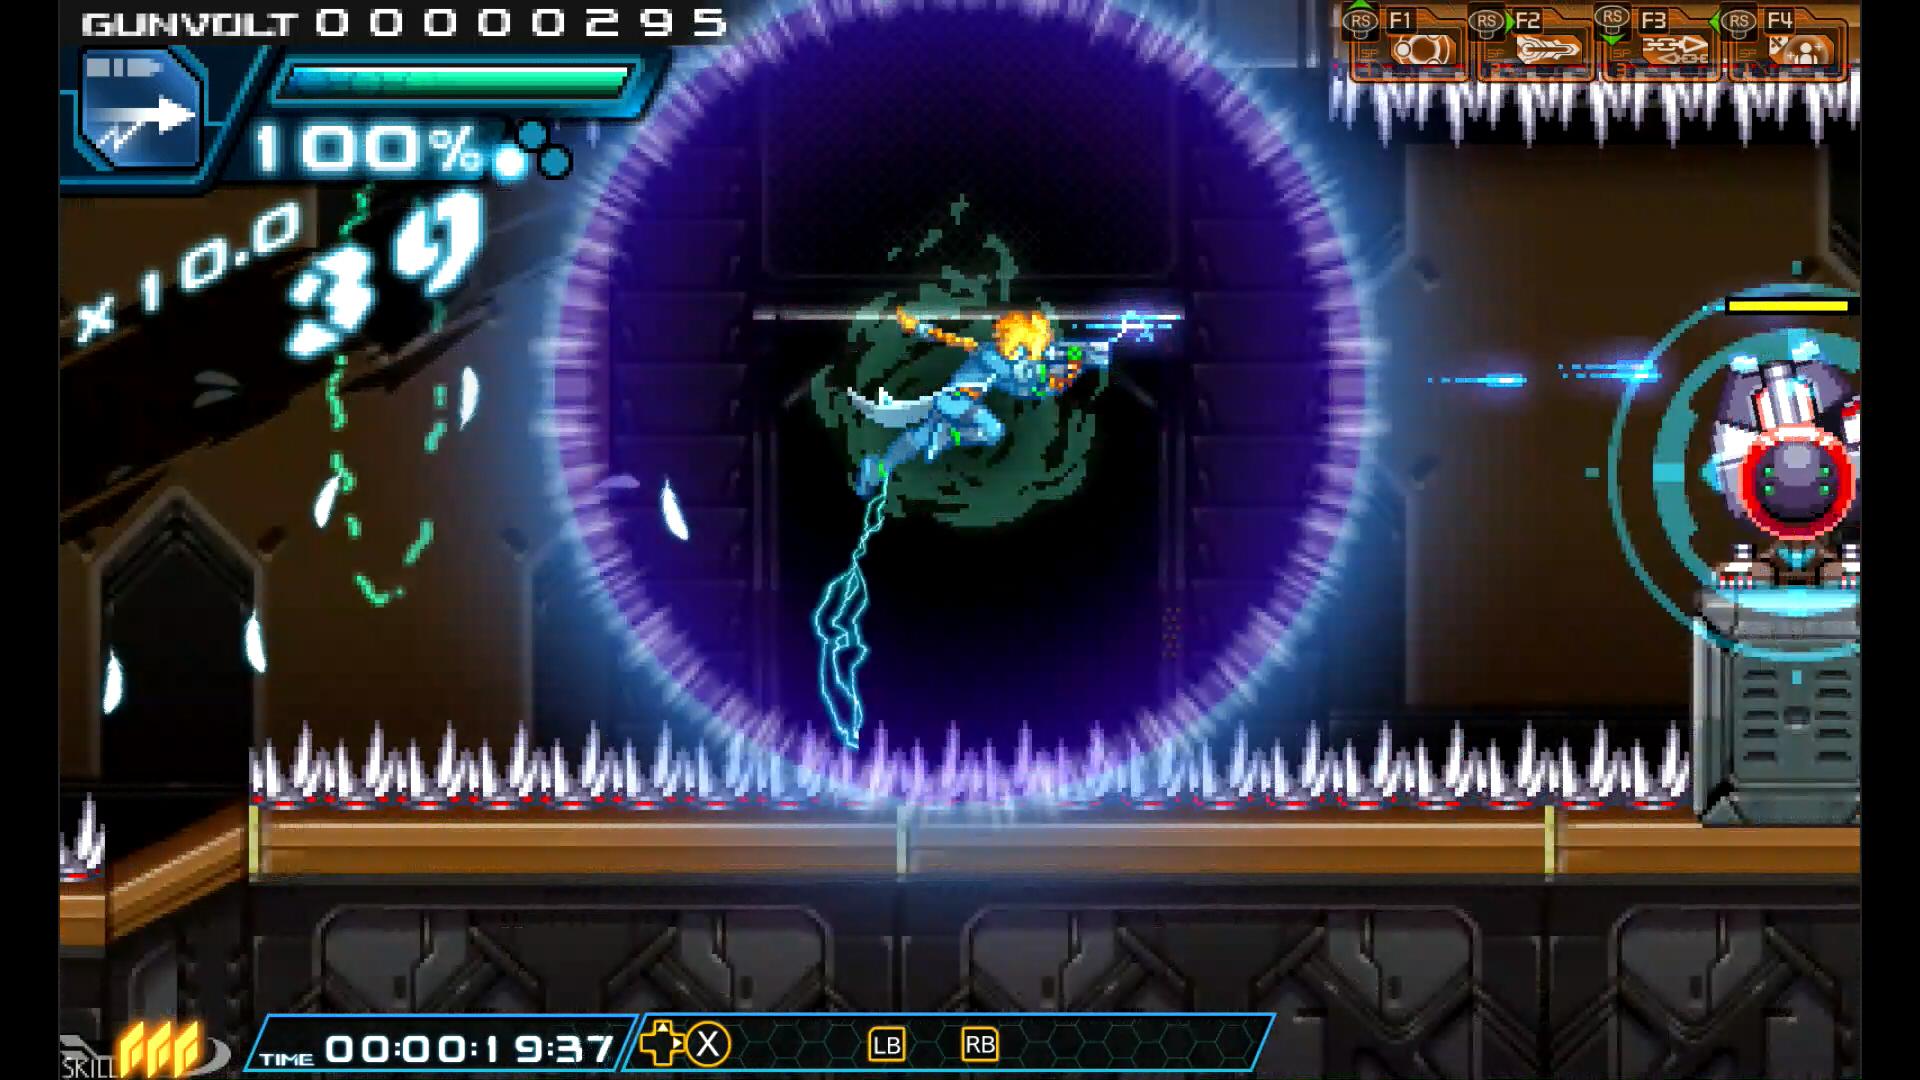 Perma-Anthem Mode 2